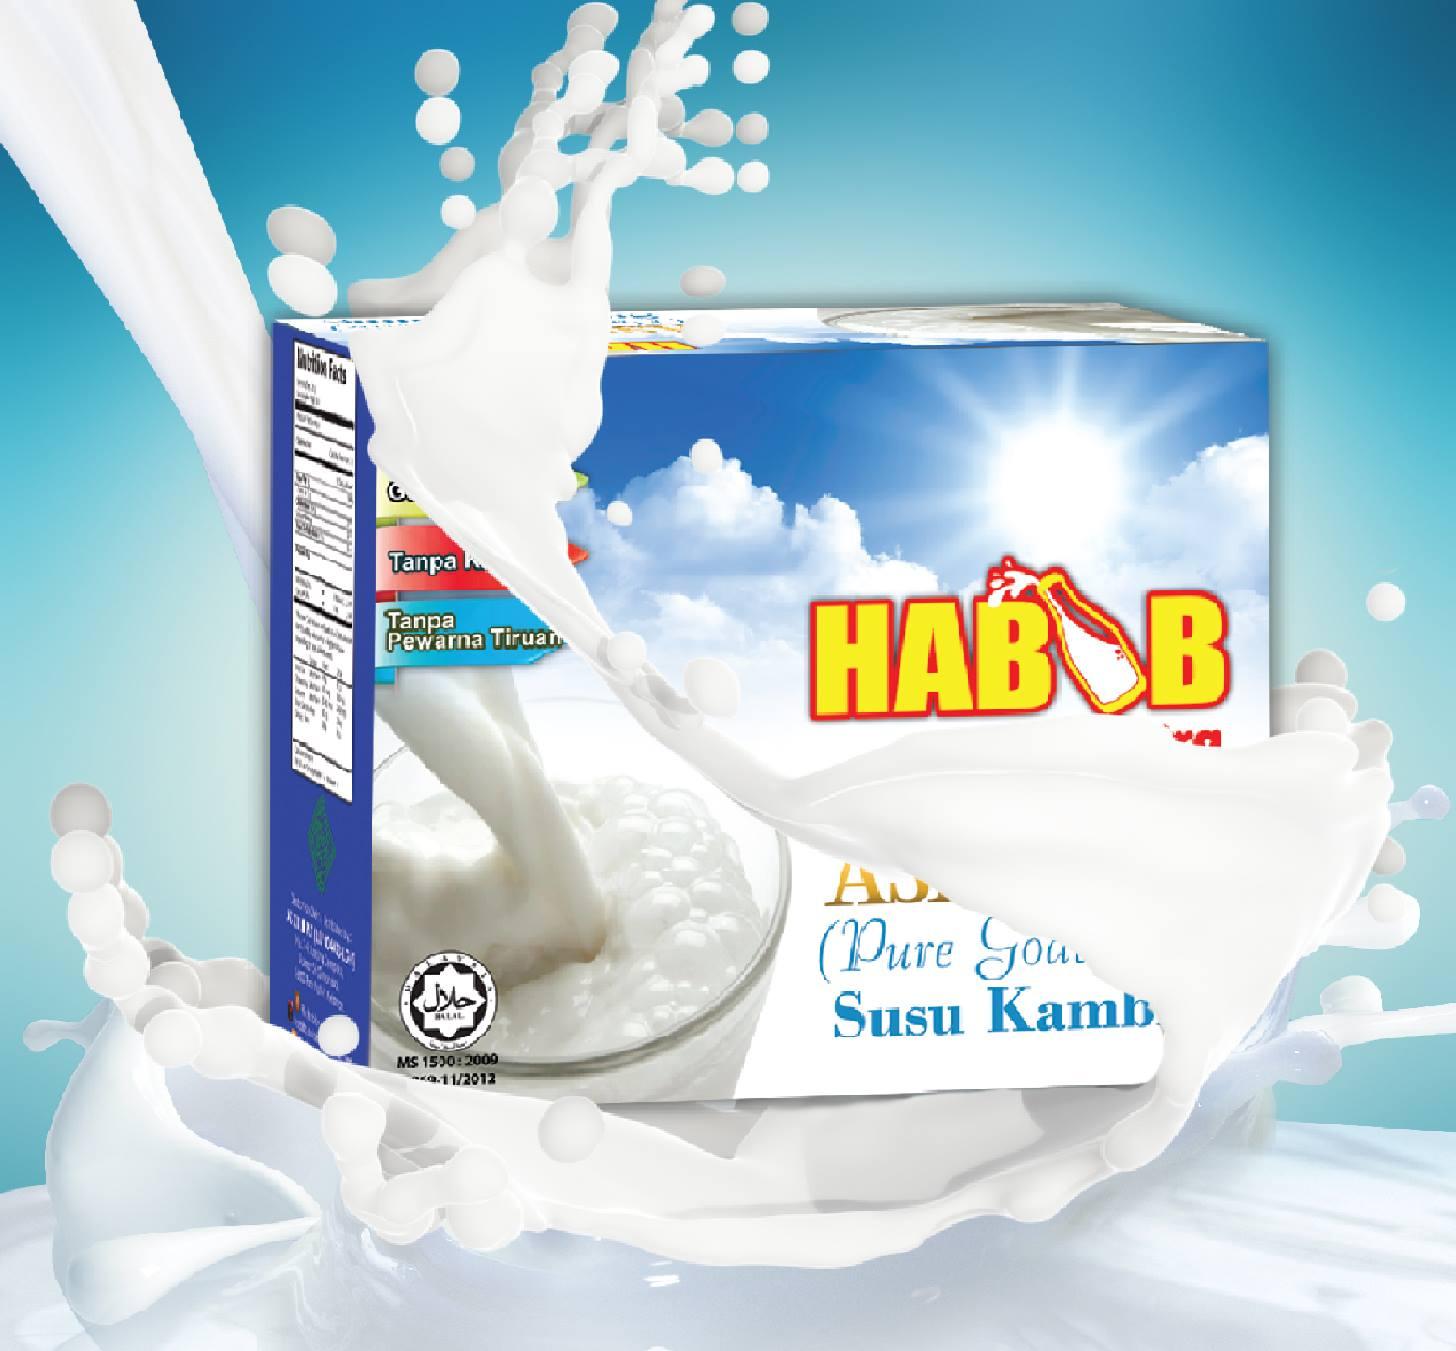 Habib Susu Kambing